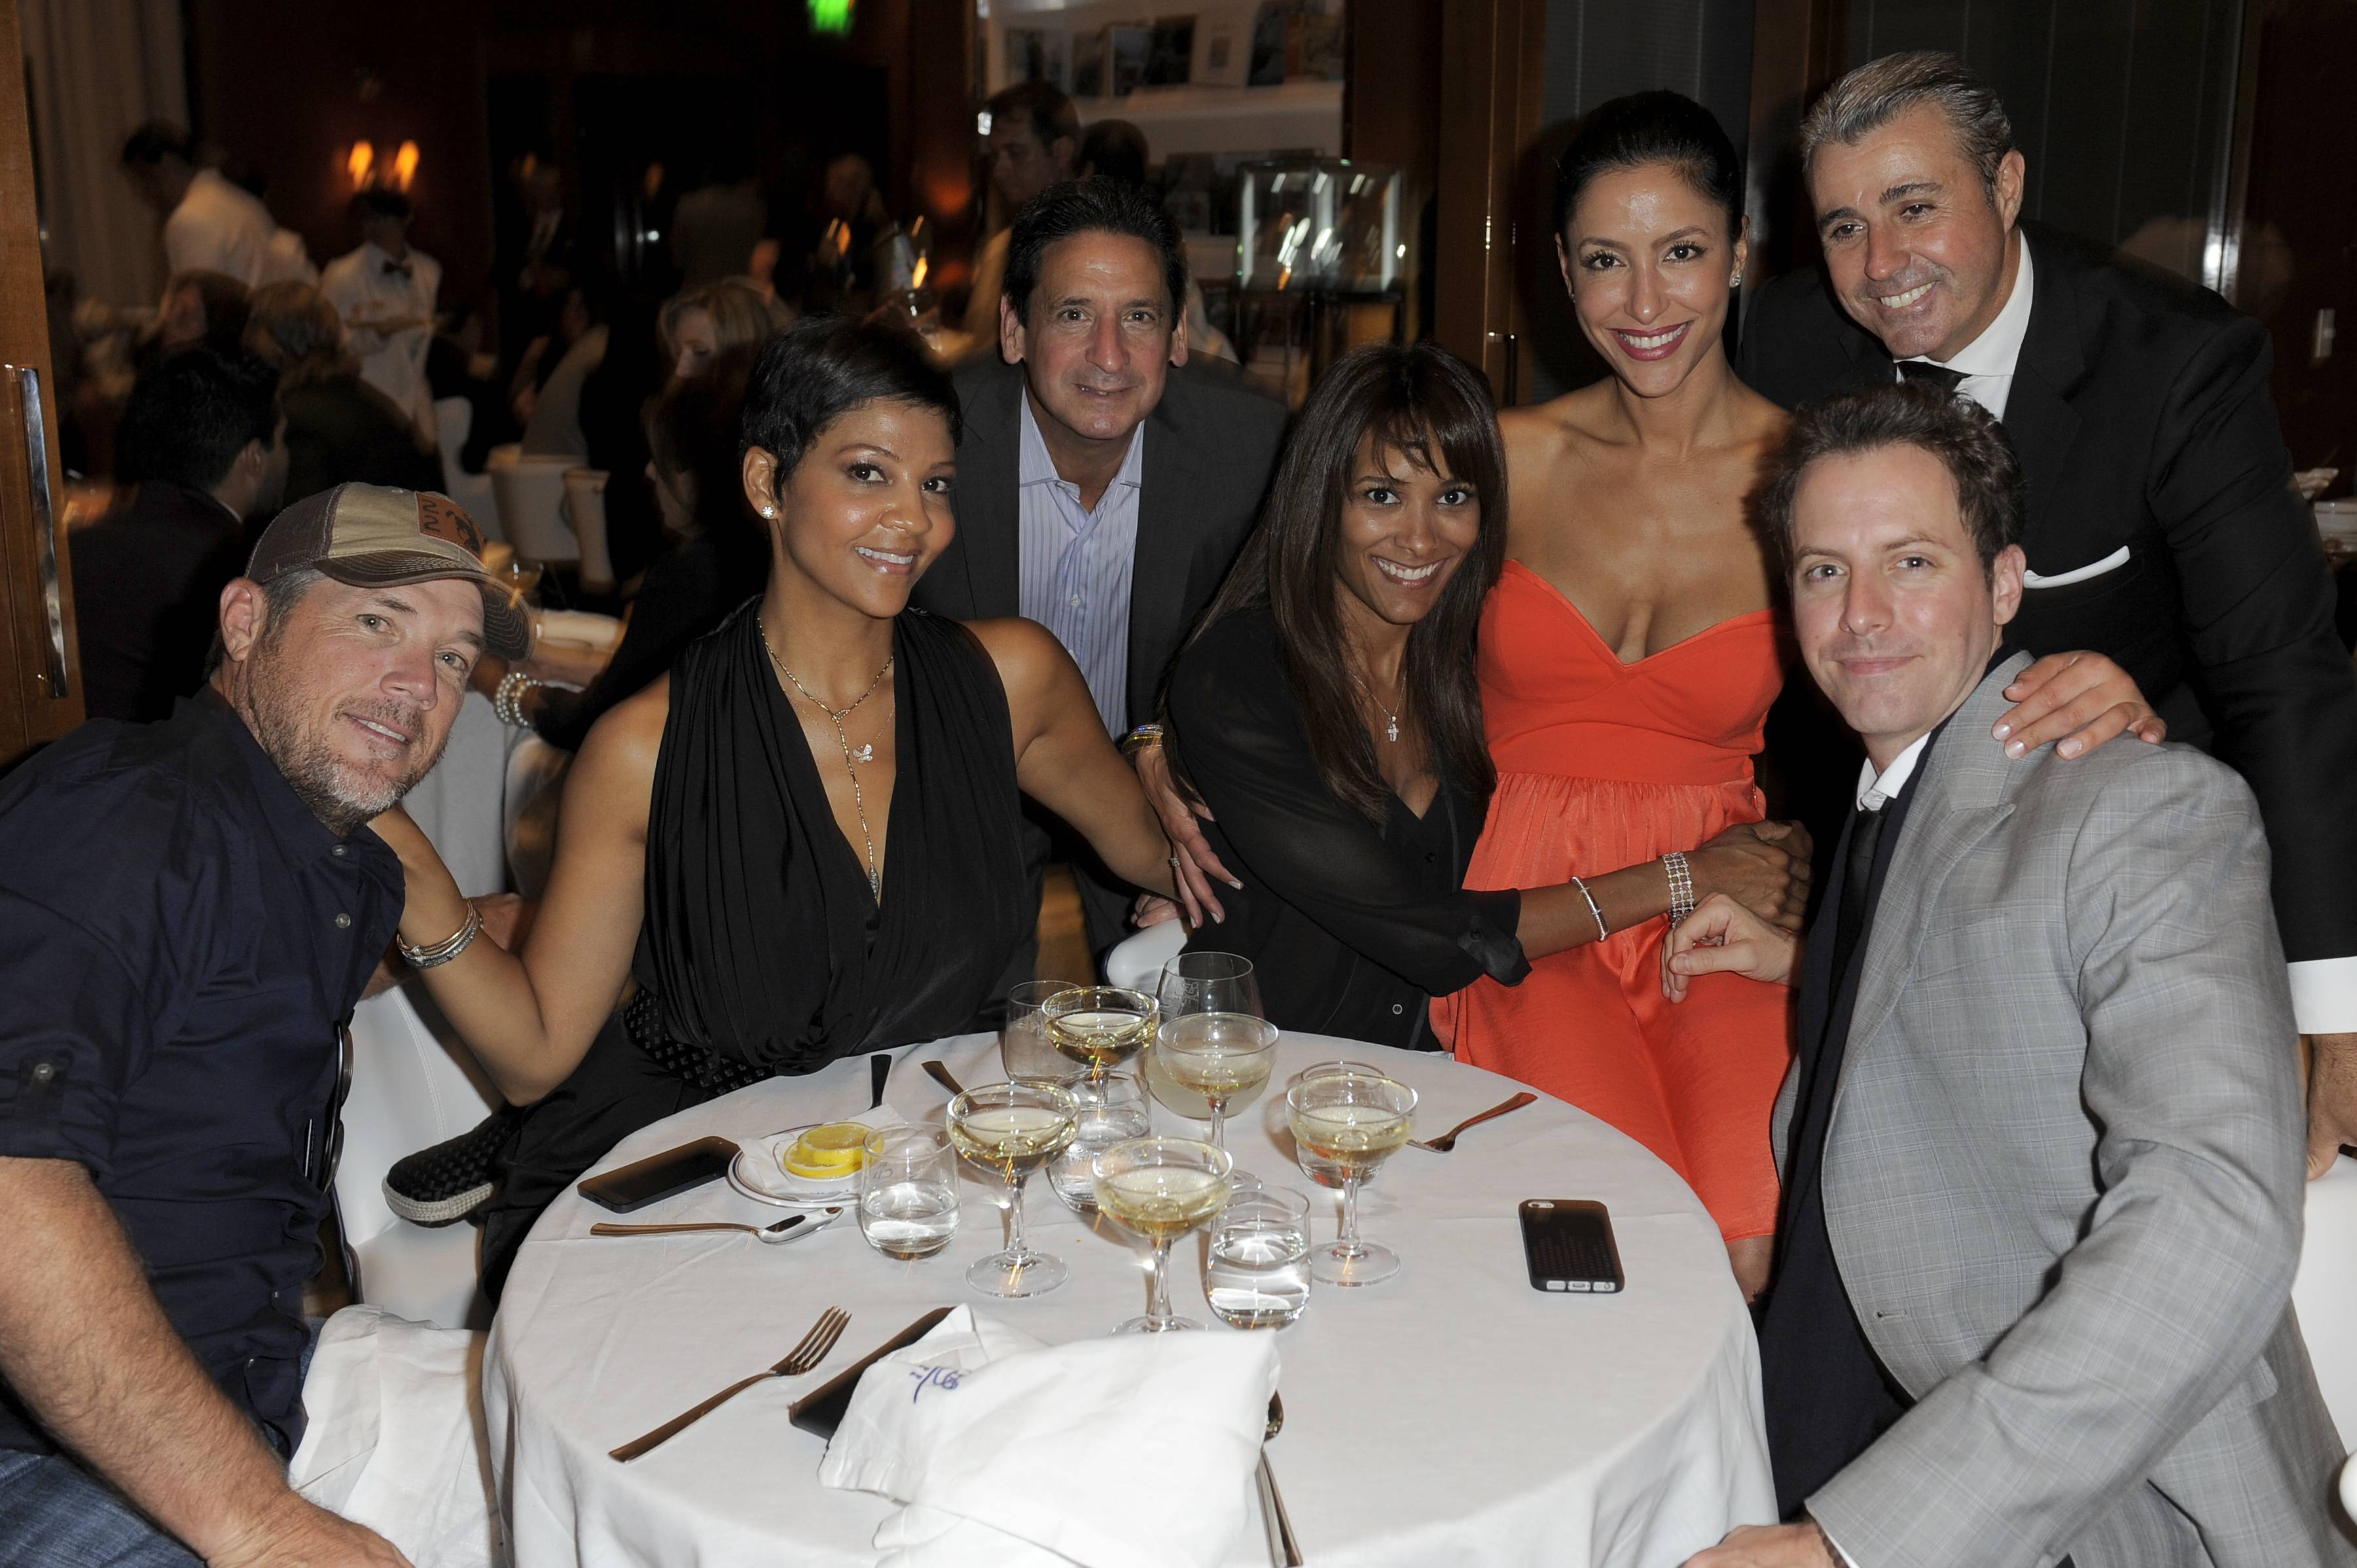 Steve Boucher, Tracy Mourning, Phil Goldfarb, Ayana Rodriguez, Violet Camacho, John Brevard